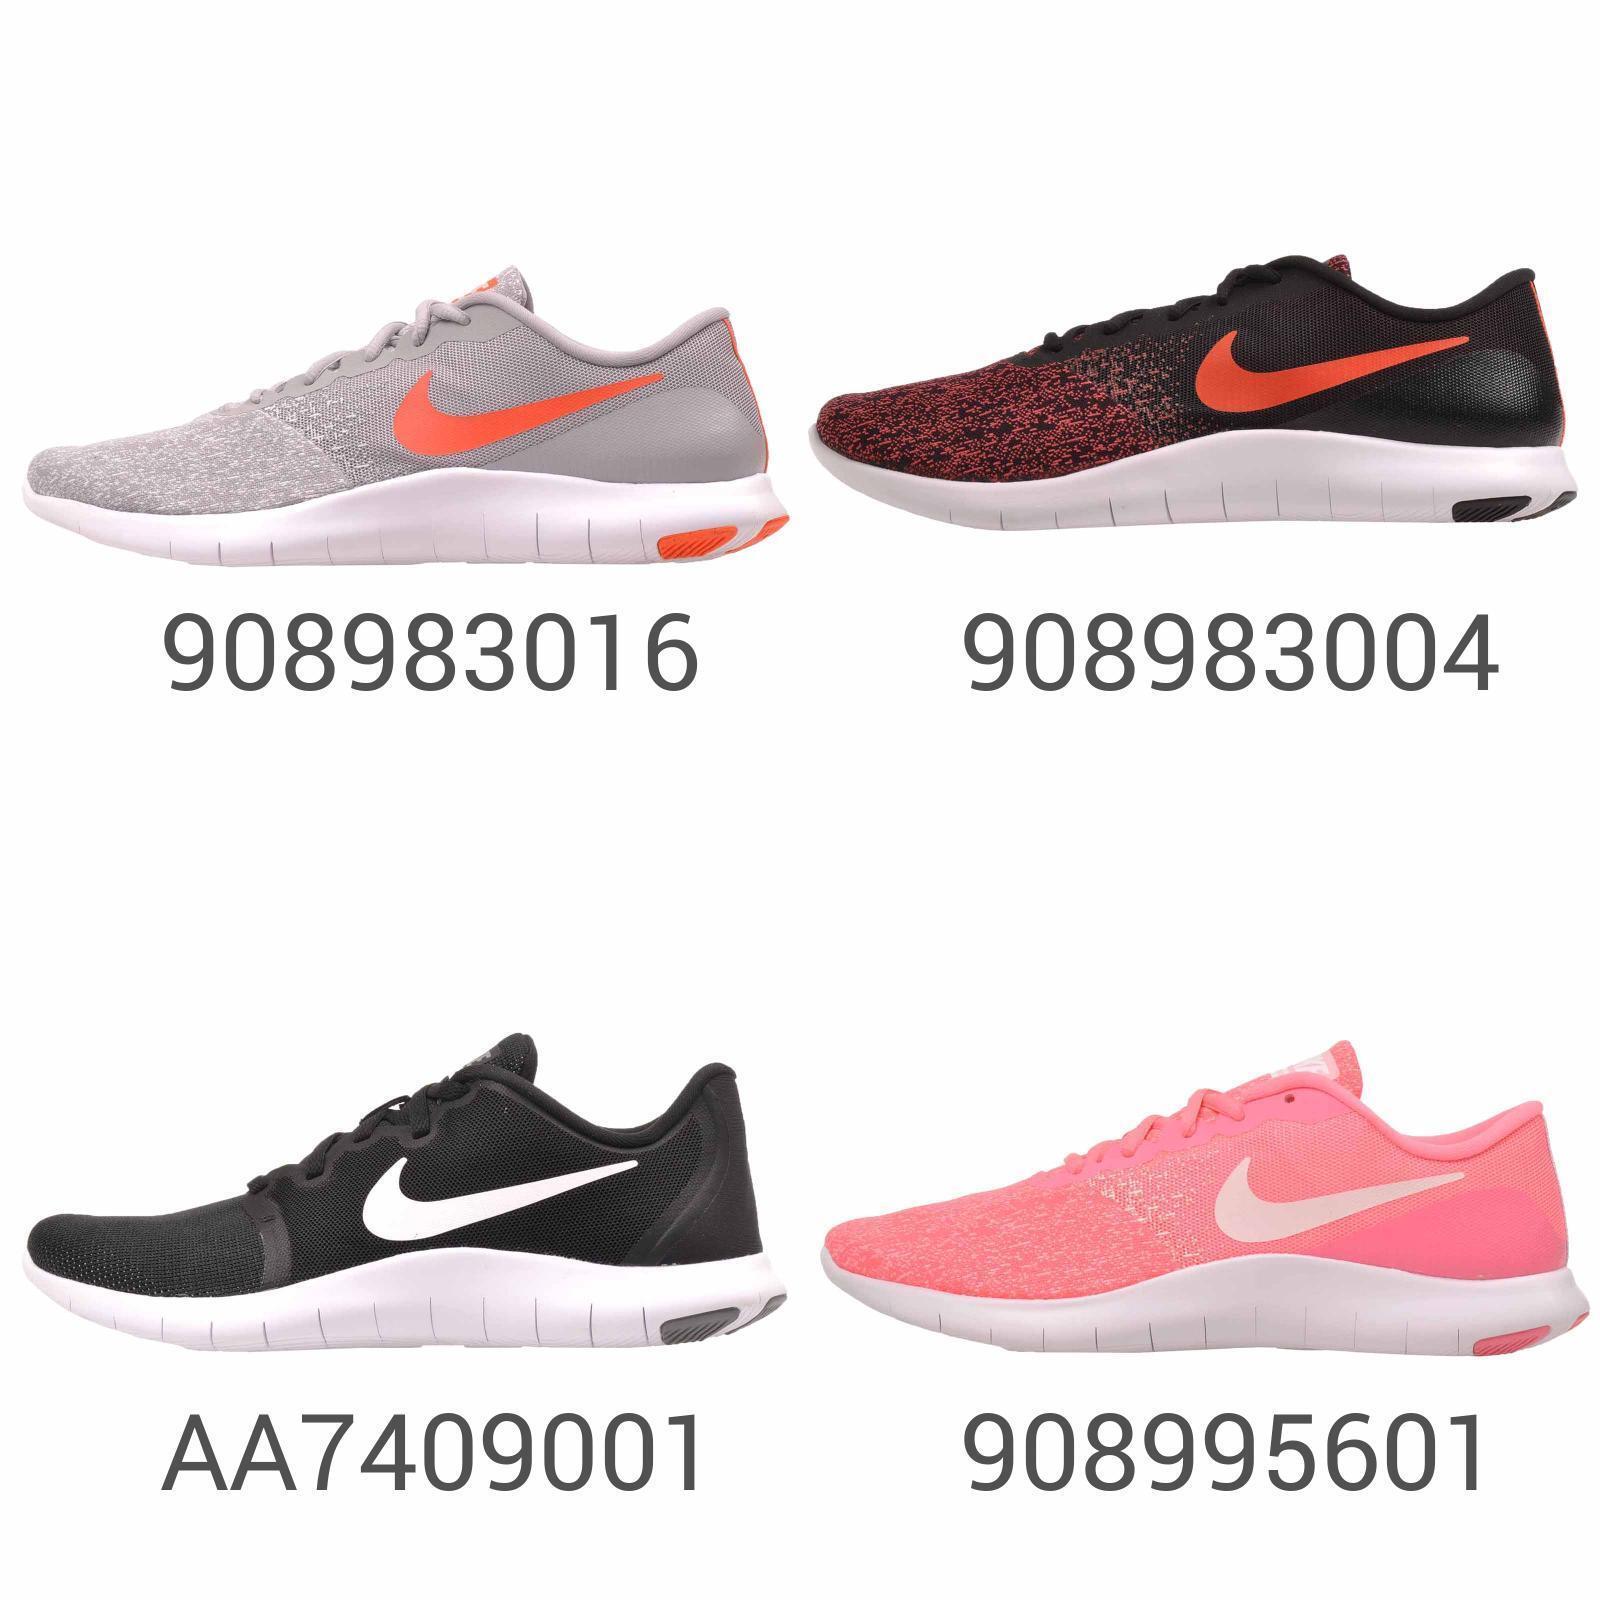 Nike Flex Contact hommesfemmesTrainingChaussuresTrainers NWOB Pick 1